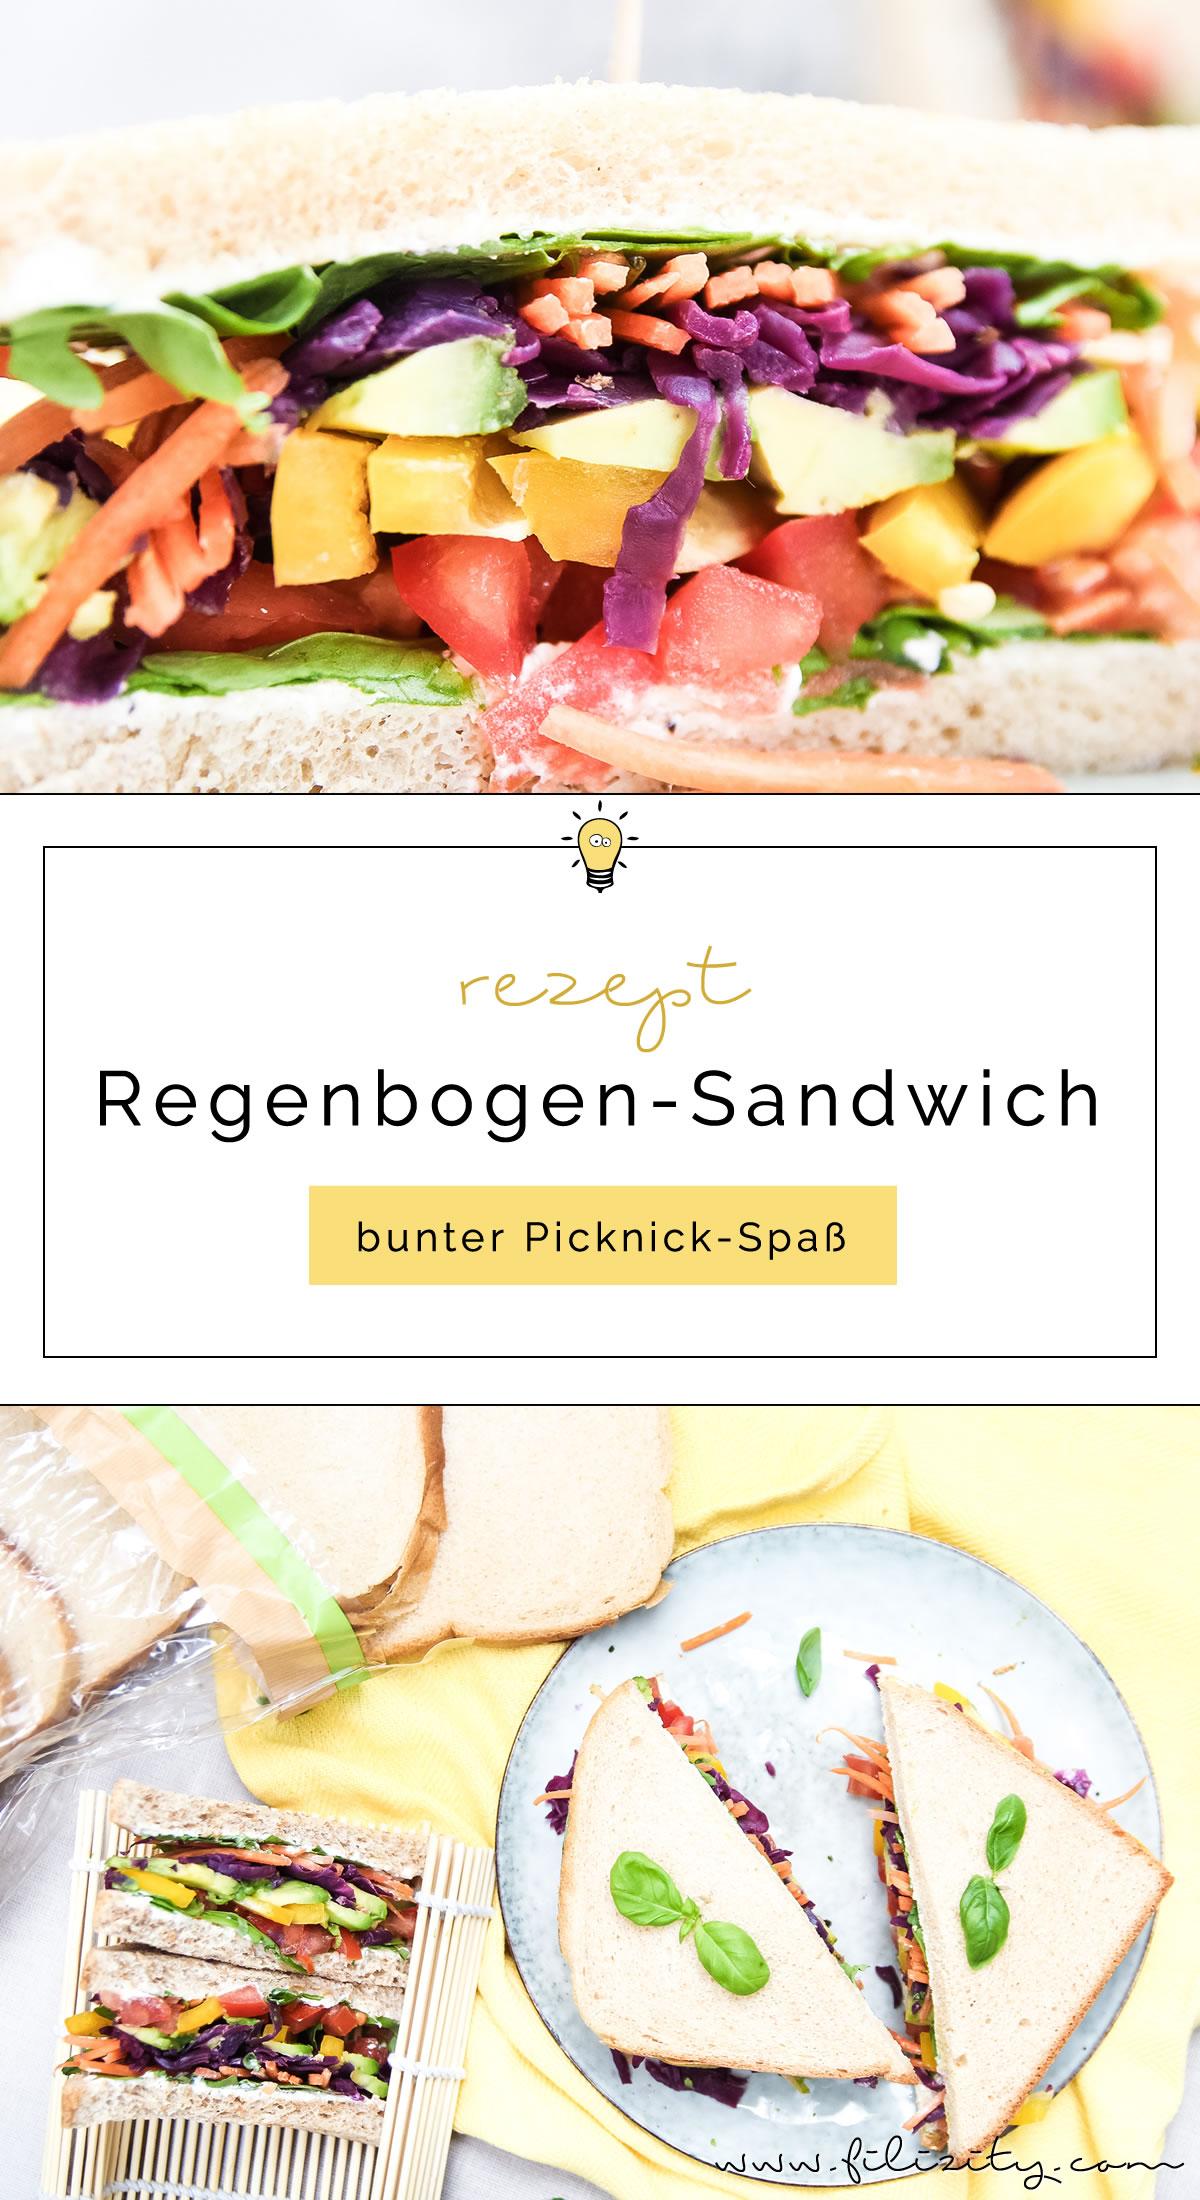 Rezept für Regenbogen-Sandwich - Vegetarischer Picknick Snack, Party-Food, Büro-Mahlzeit oder Pausenbrot | Filizity.com | Food-Blog aus dem Rheinland #sandwich #picknick